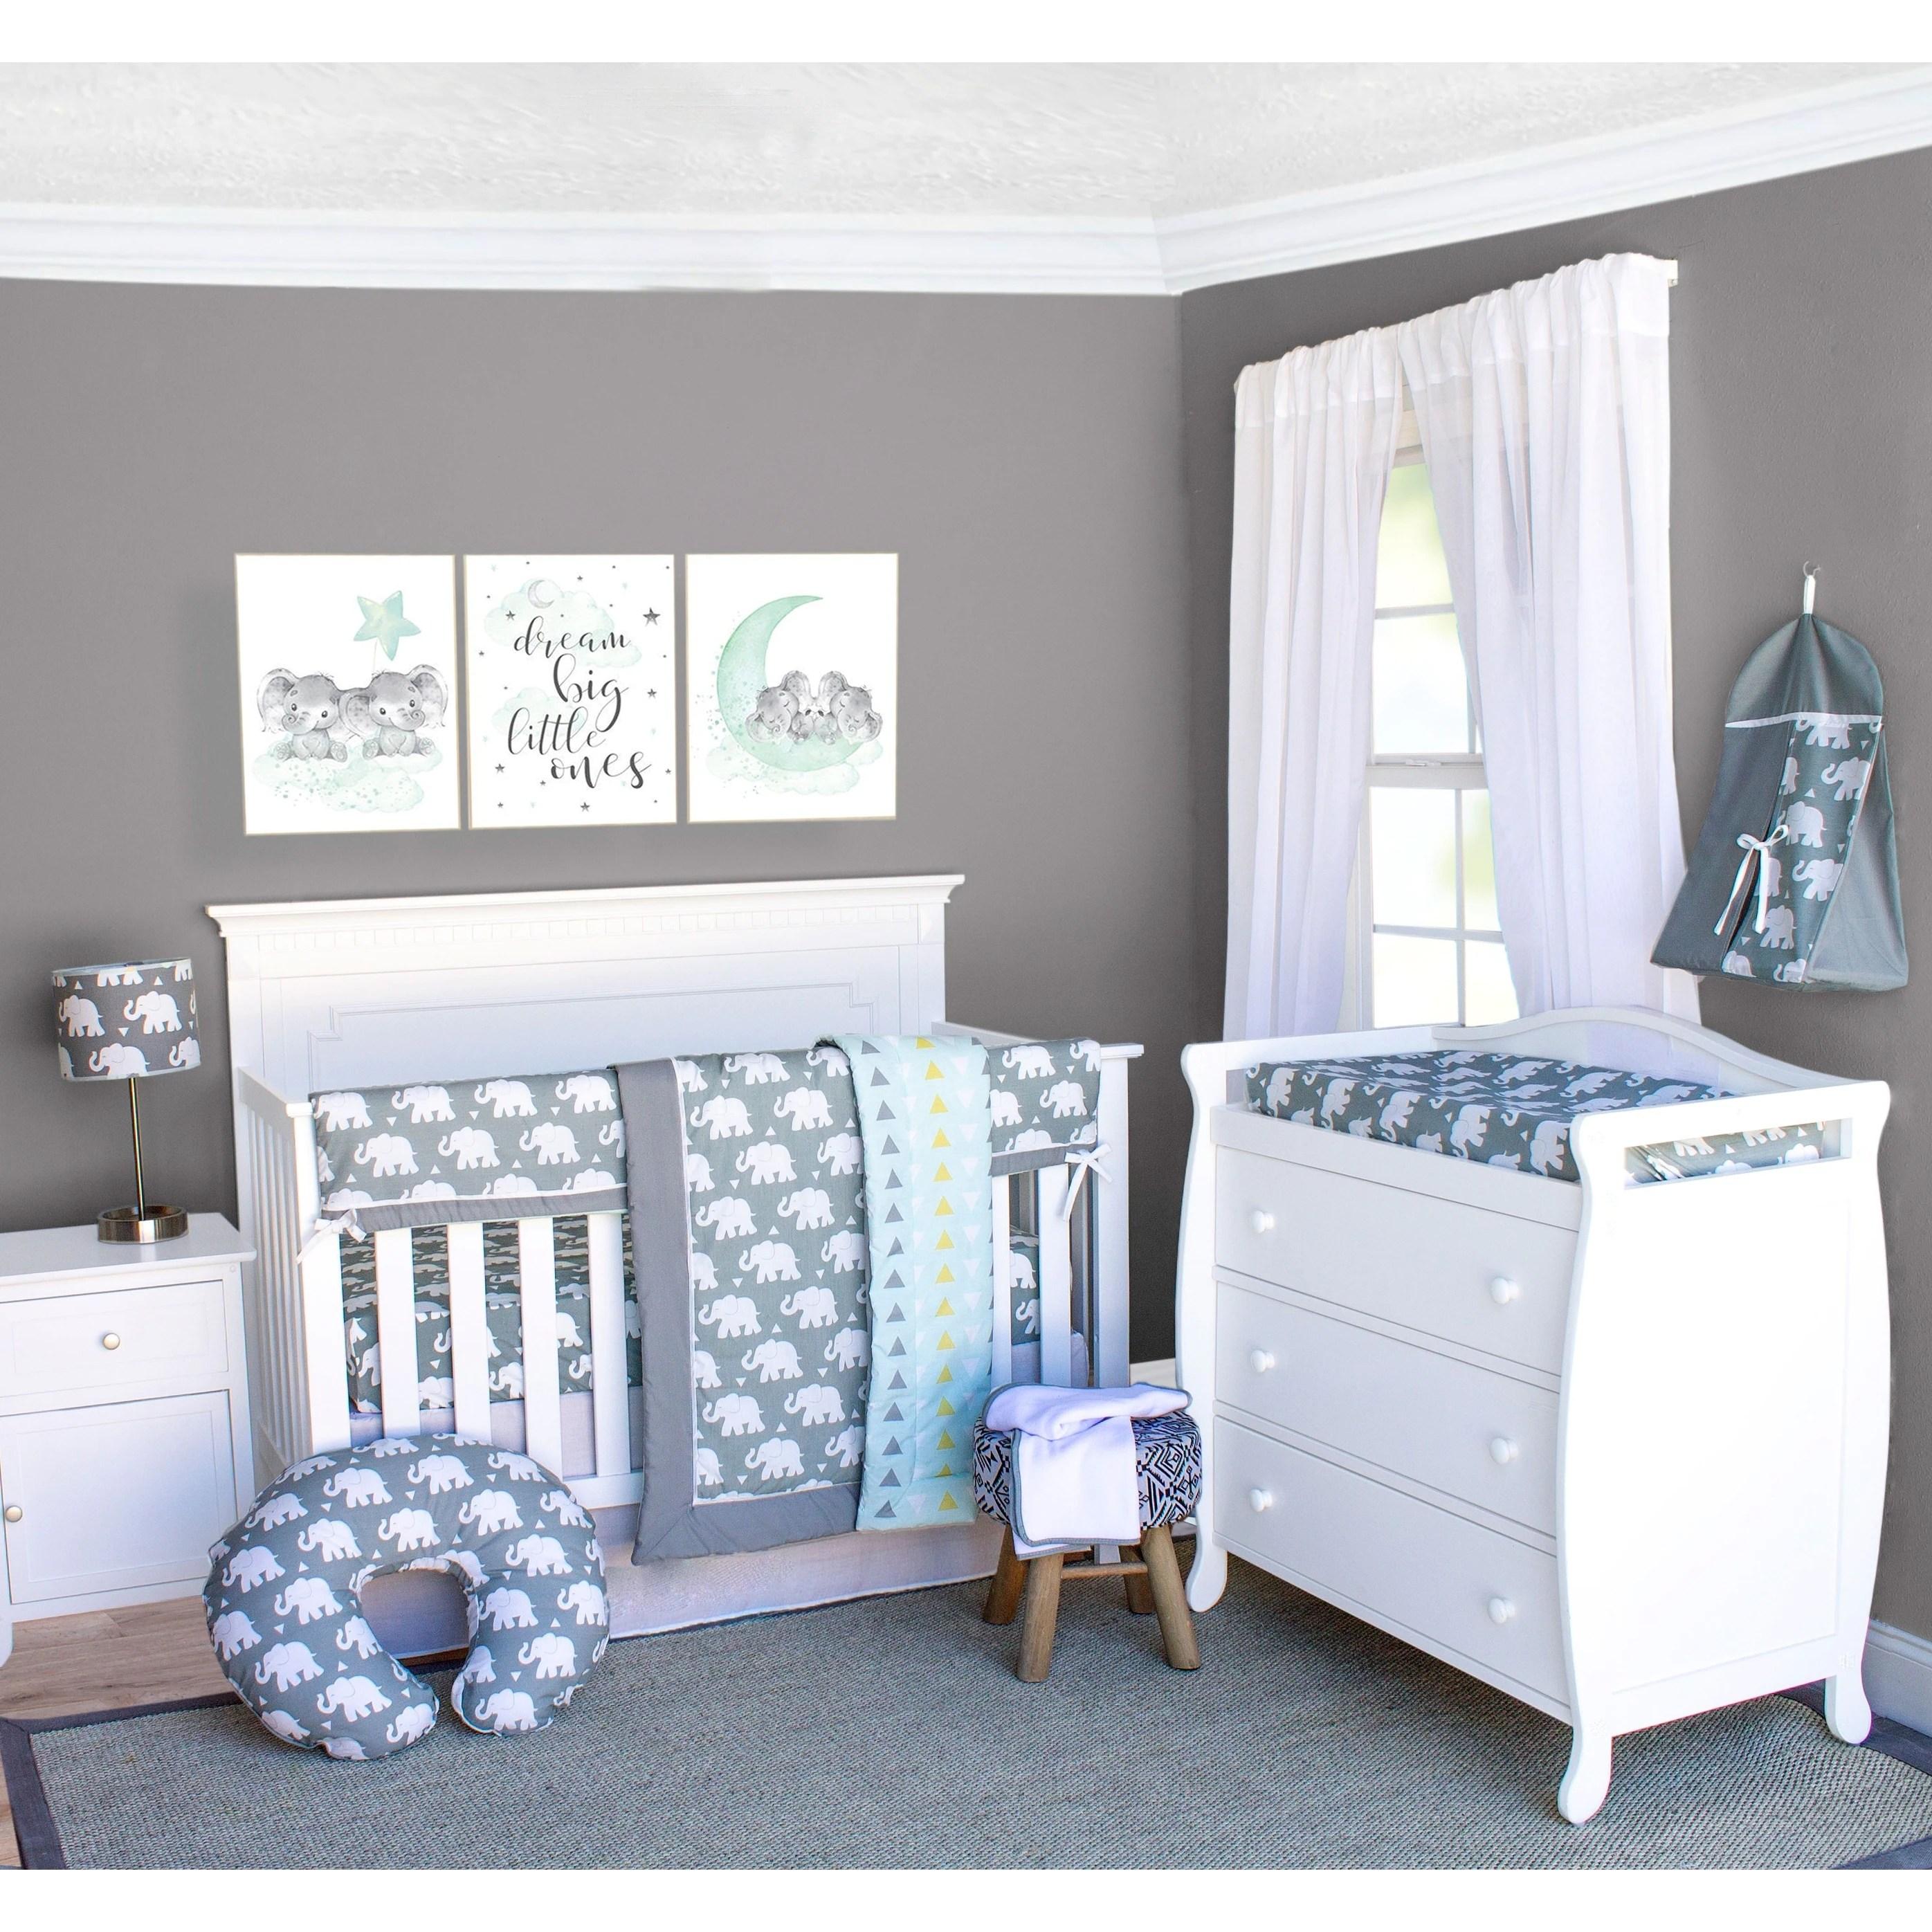 Shop Pam Grace Creations Elephant Crib Baby Bedding Set 6 Piece Crib Set Overstock 12304178